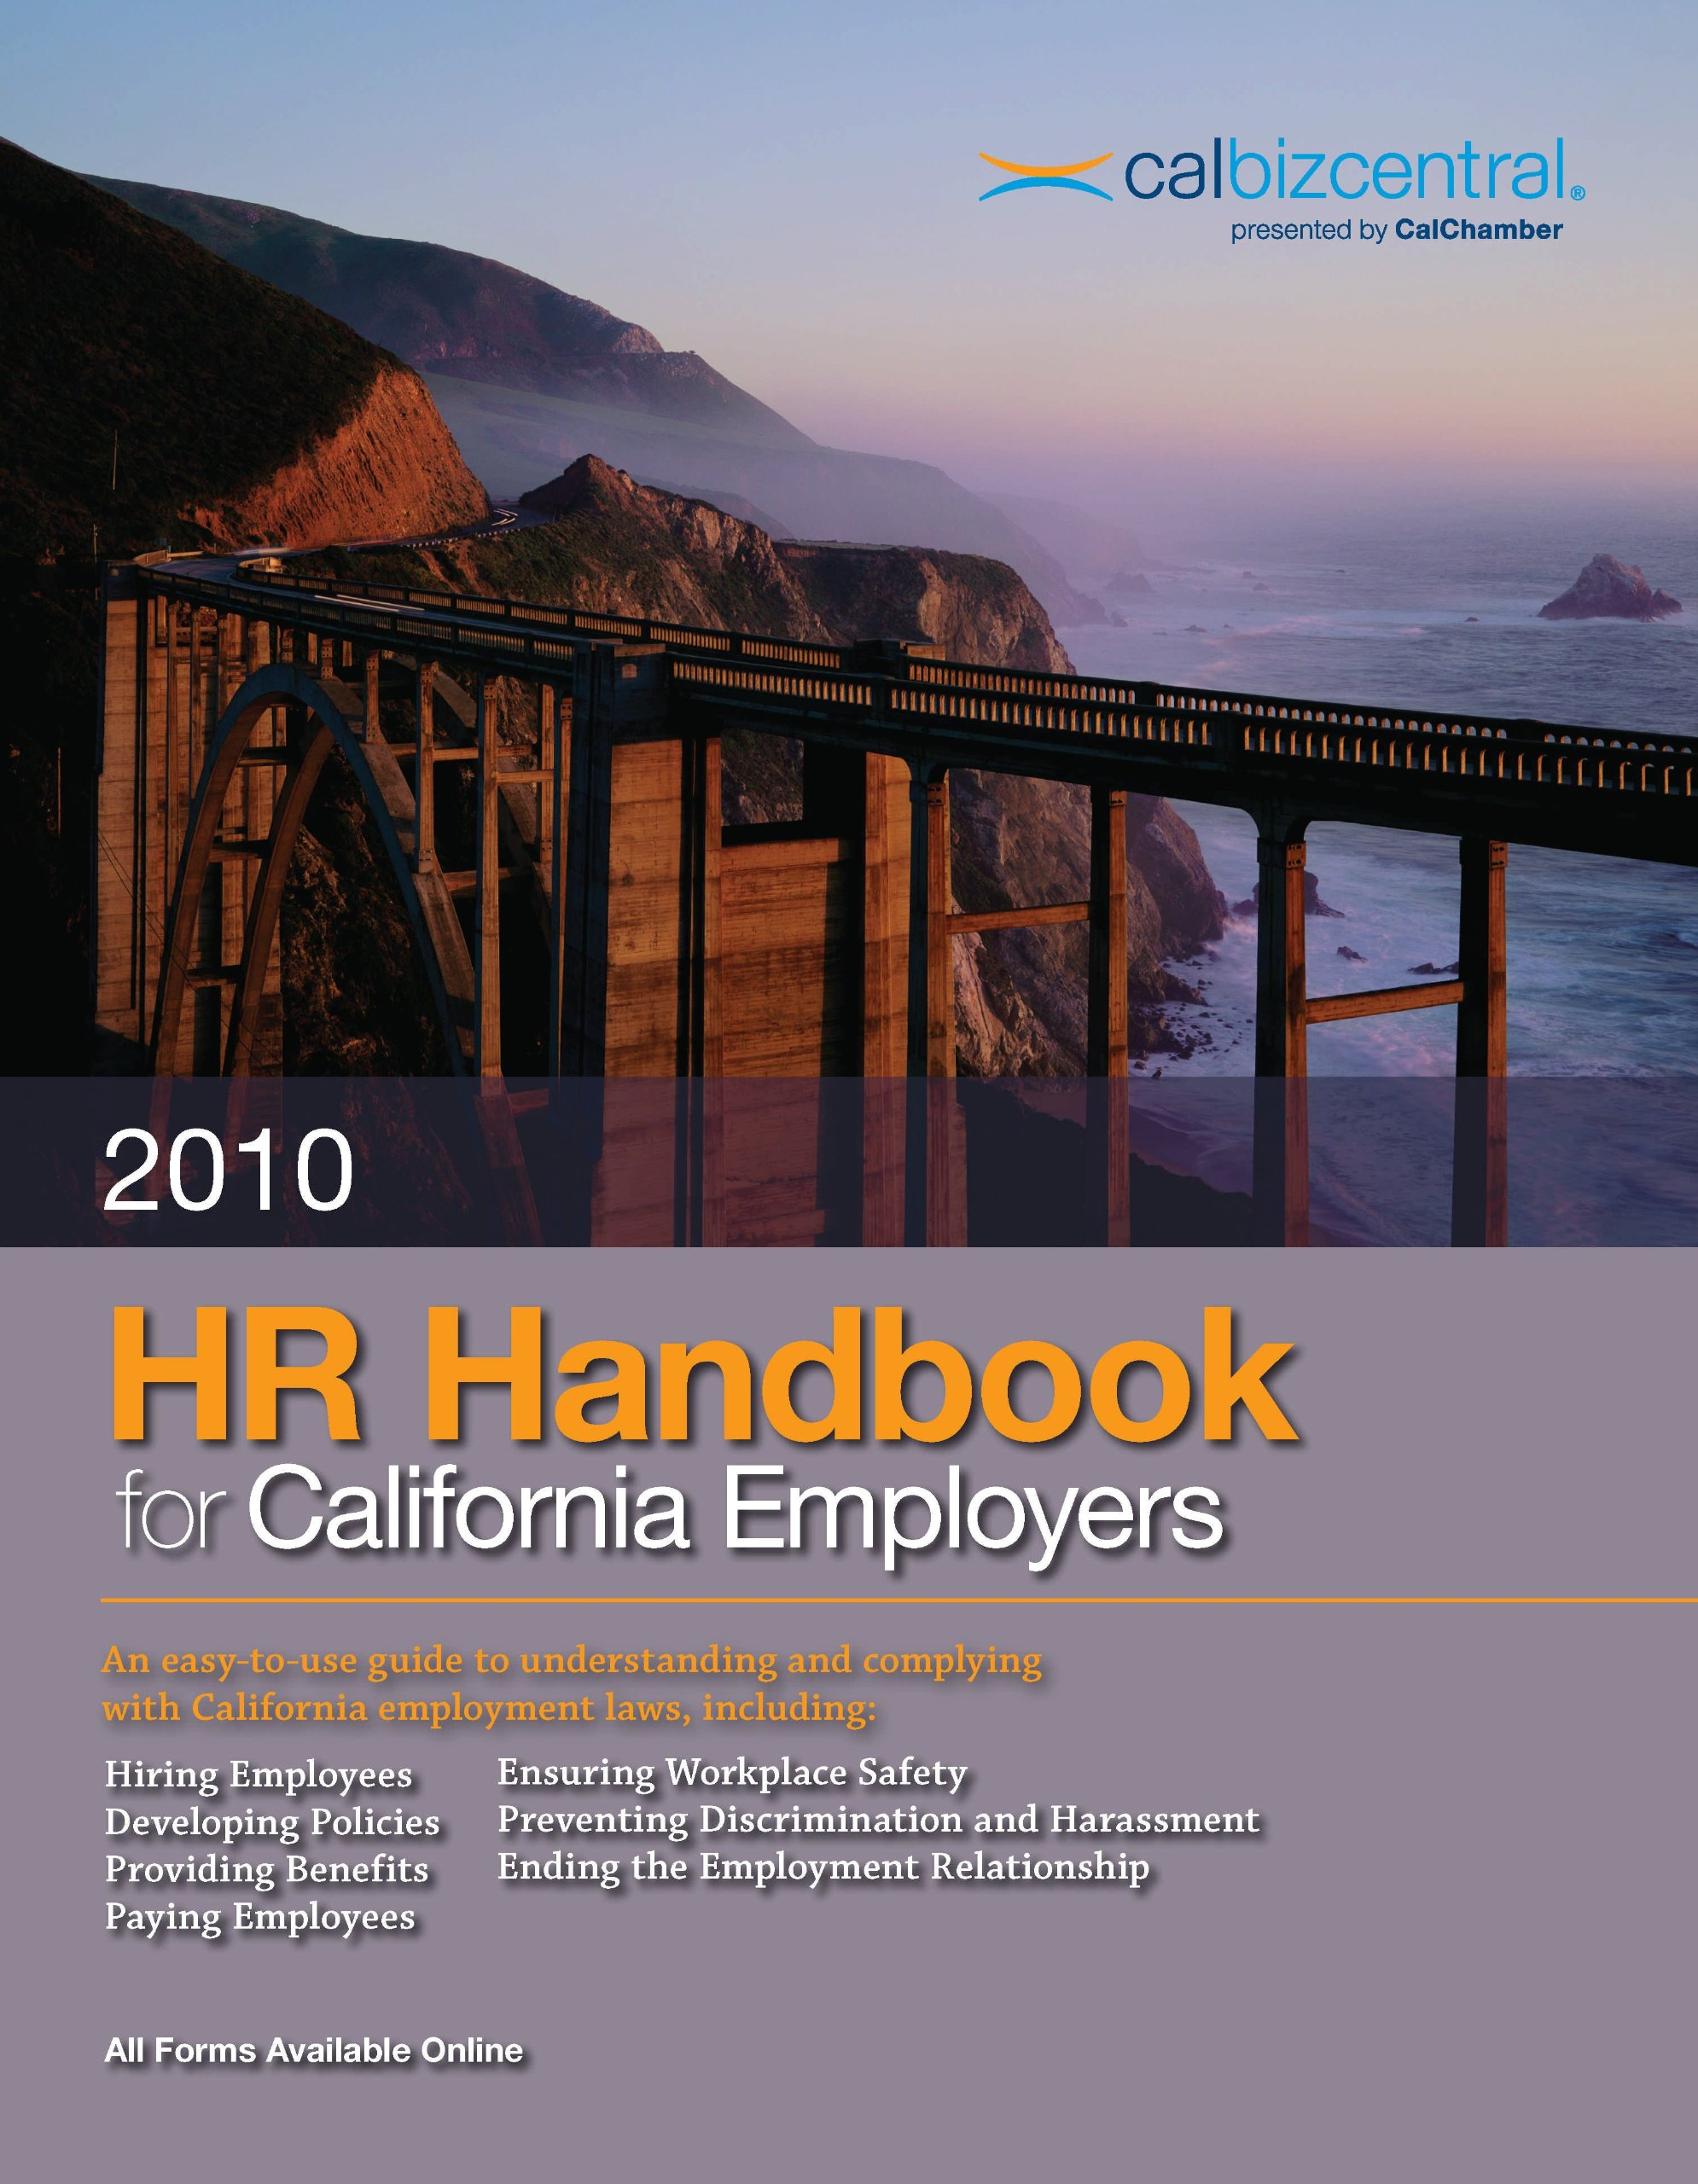 2010 HR Handbook for California Employers PDF